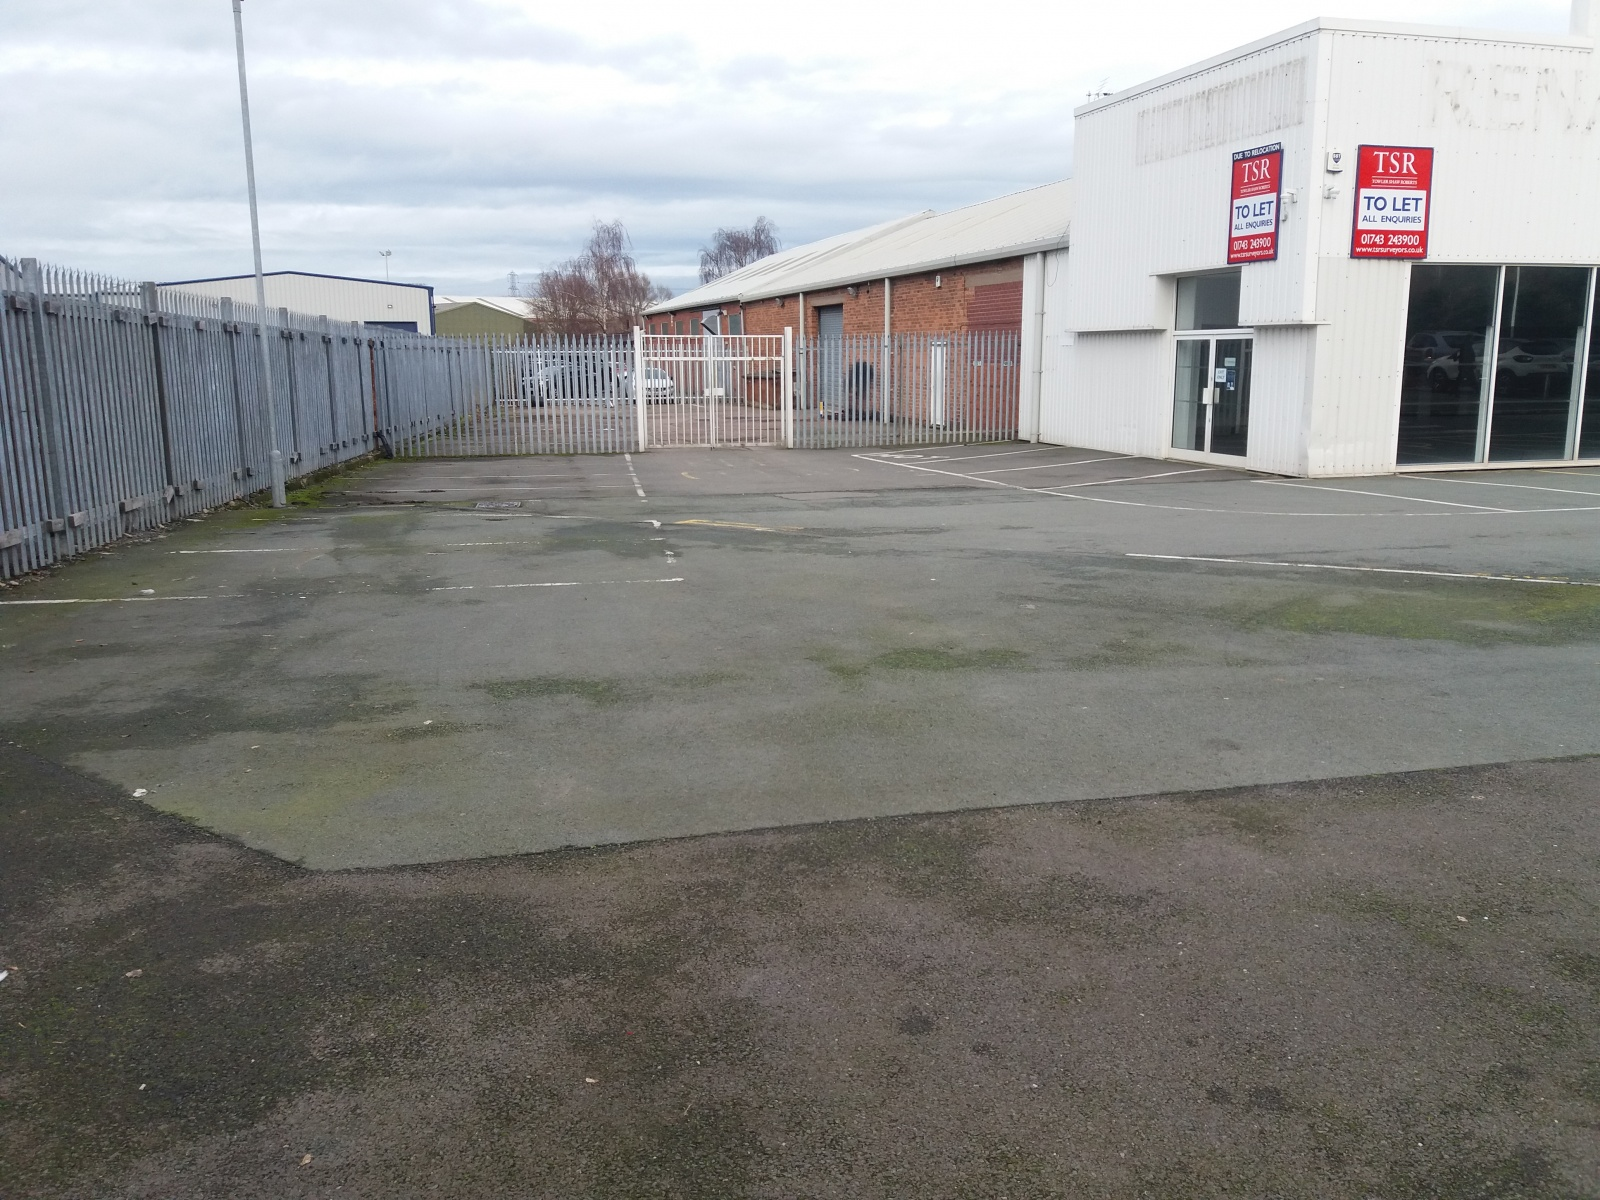 Waverley Garage, Featherbed Lane, Shrewsbury, Shropshire